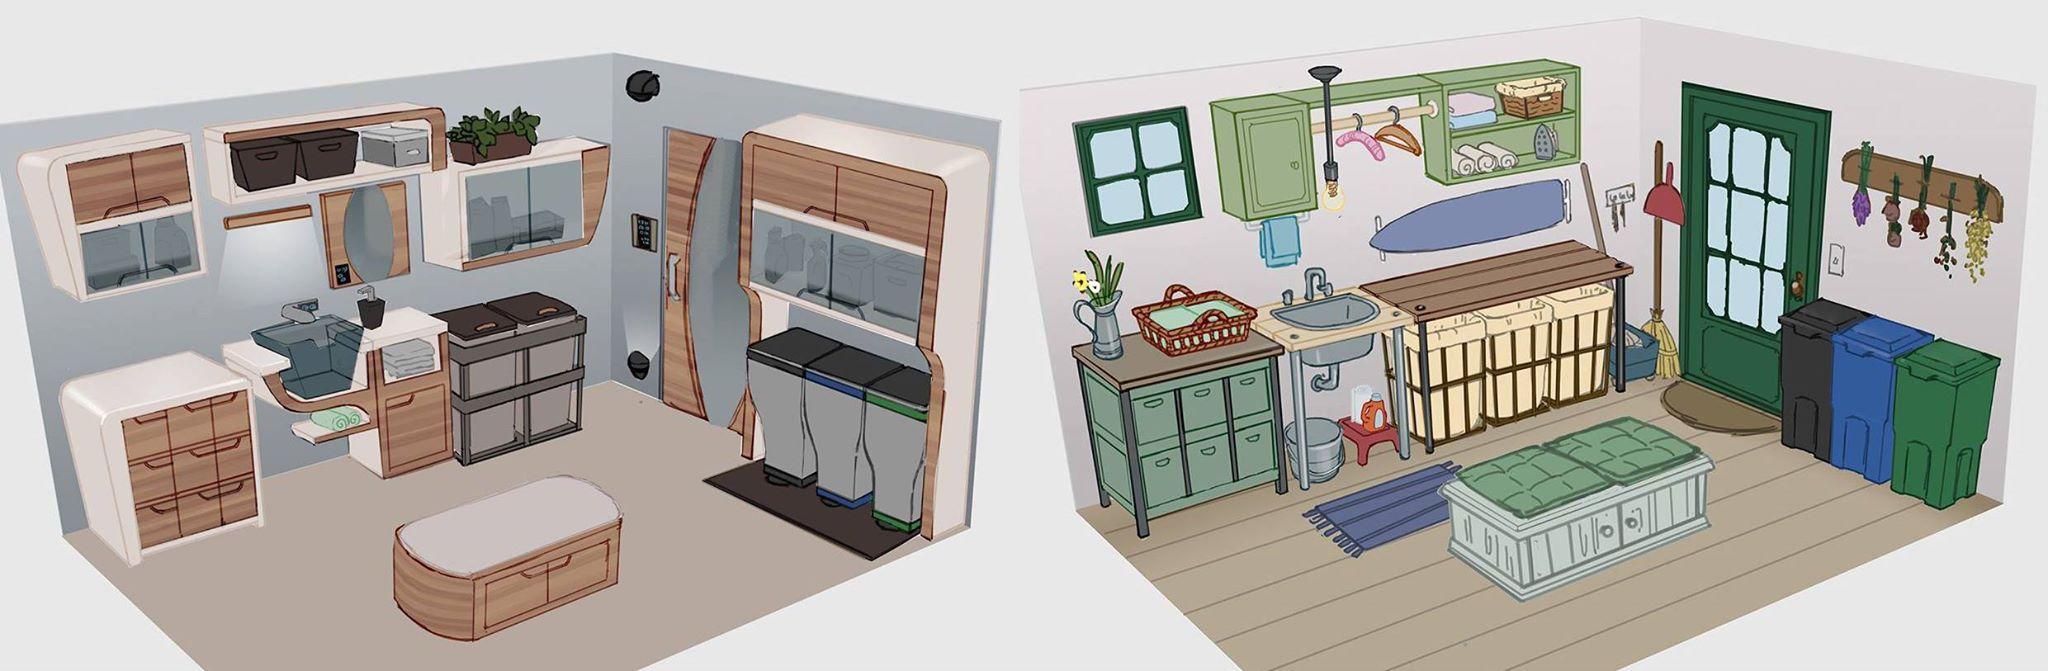 umfrage zum grafikstil des neuen die sims 4 accessoires. Black Bedroom Furniture Sets. Home Design Ideas